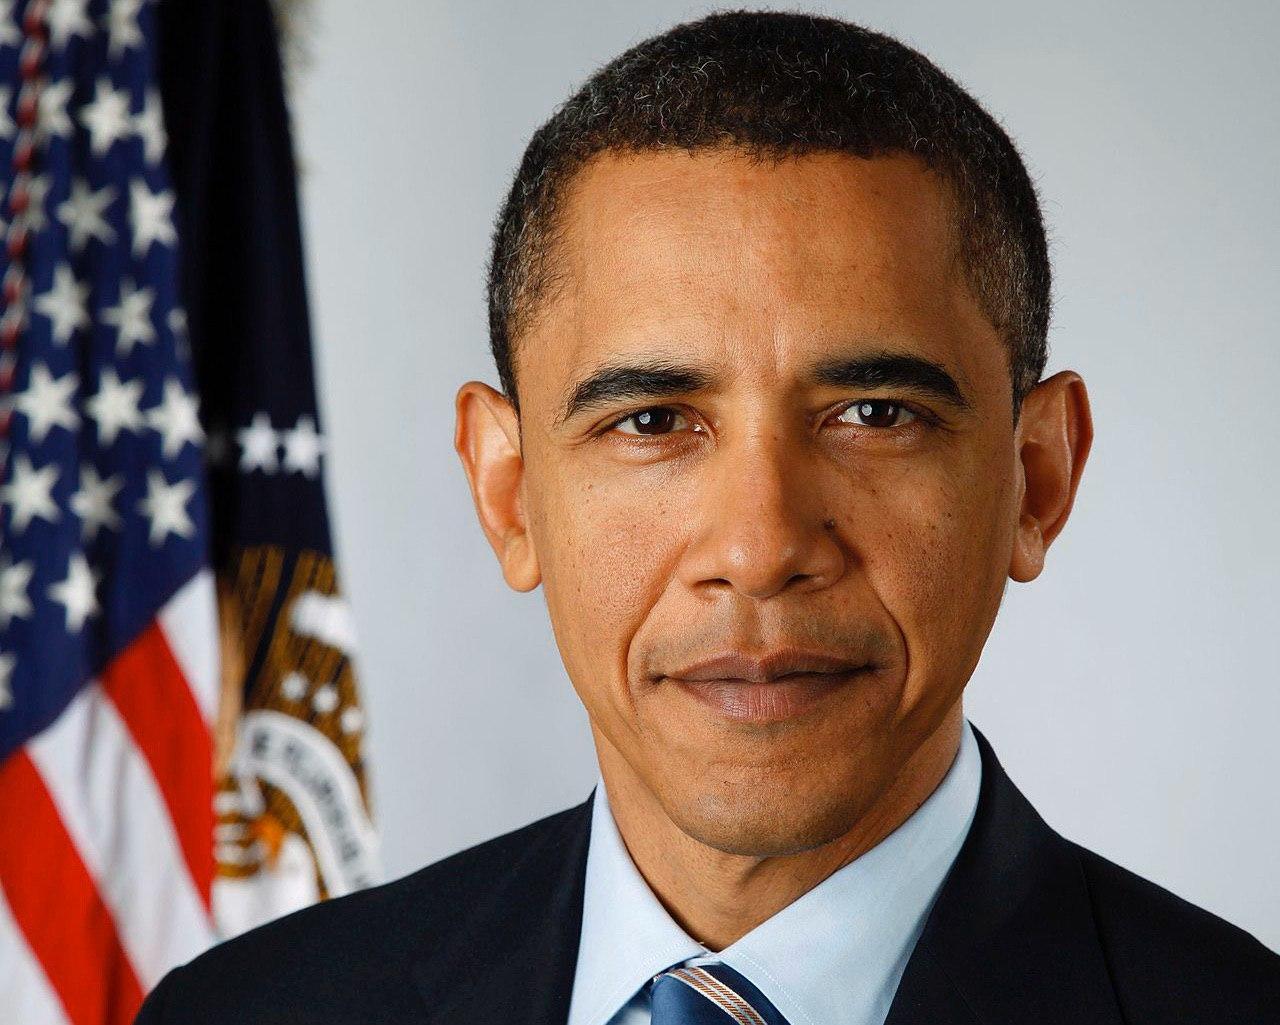 "<p>Барак Обама. Фото © <a href=""https://ru.wikipedia.org/wiki/%D0%9E%D0%B1%D0%B0%D0%BC%D0%B0,_%D0%91%D0%B0%D1%80%D0%B0%D0%BA#/media/%D0%A4%D0%B0%D0%B9%D0%BB:Official_portrait_of_Barack_Obama.jpg"" target=""_blank"" rel=""noopener noreferrer"">Wikipedia</a></p>"